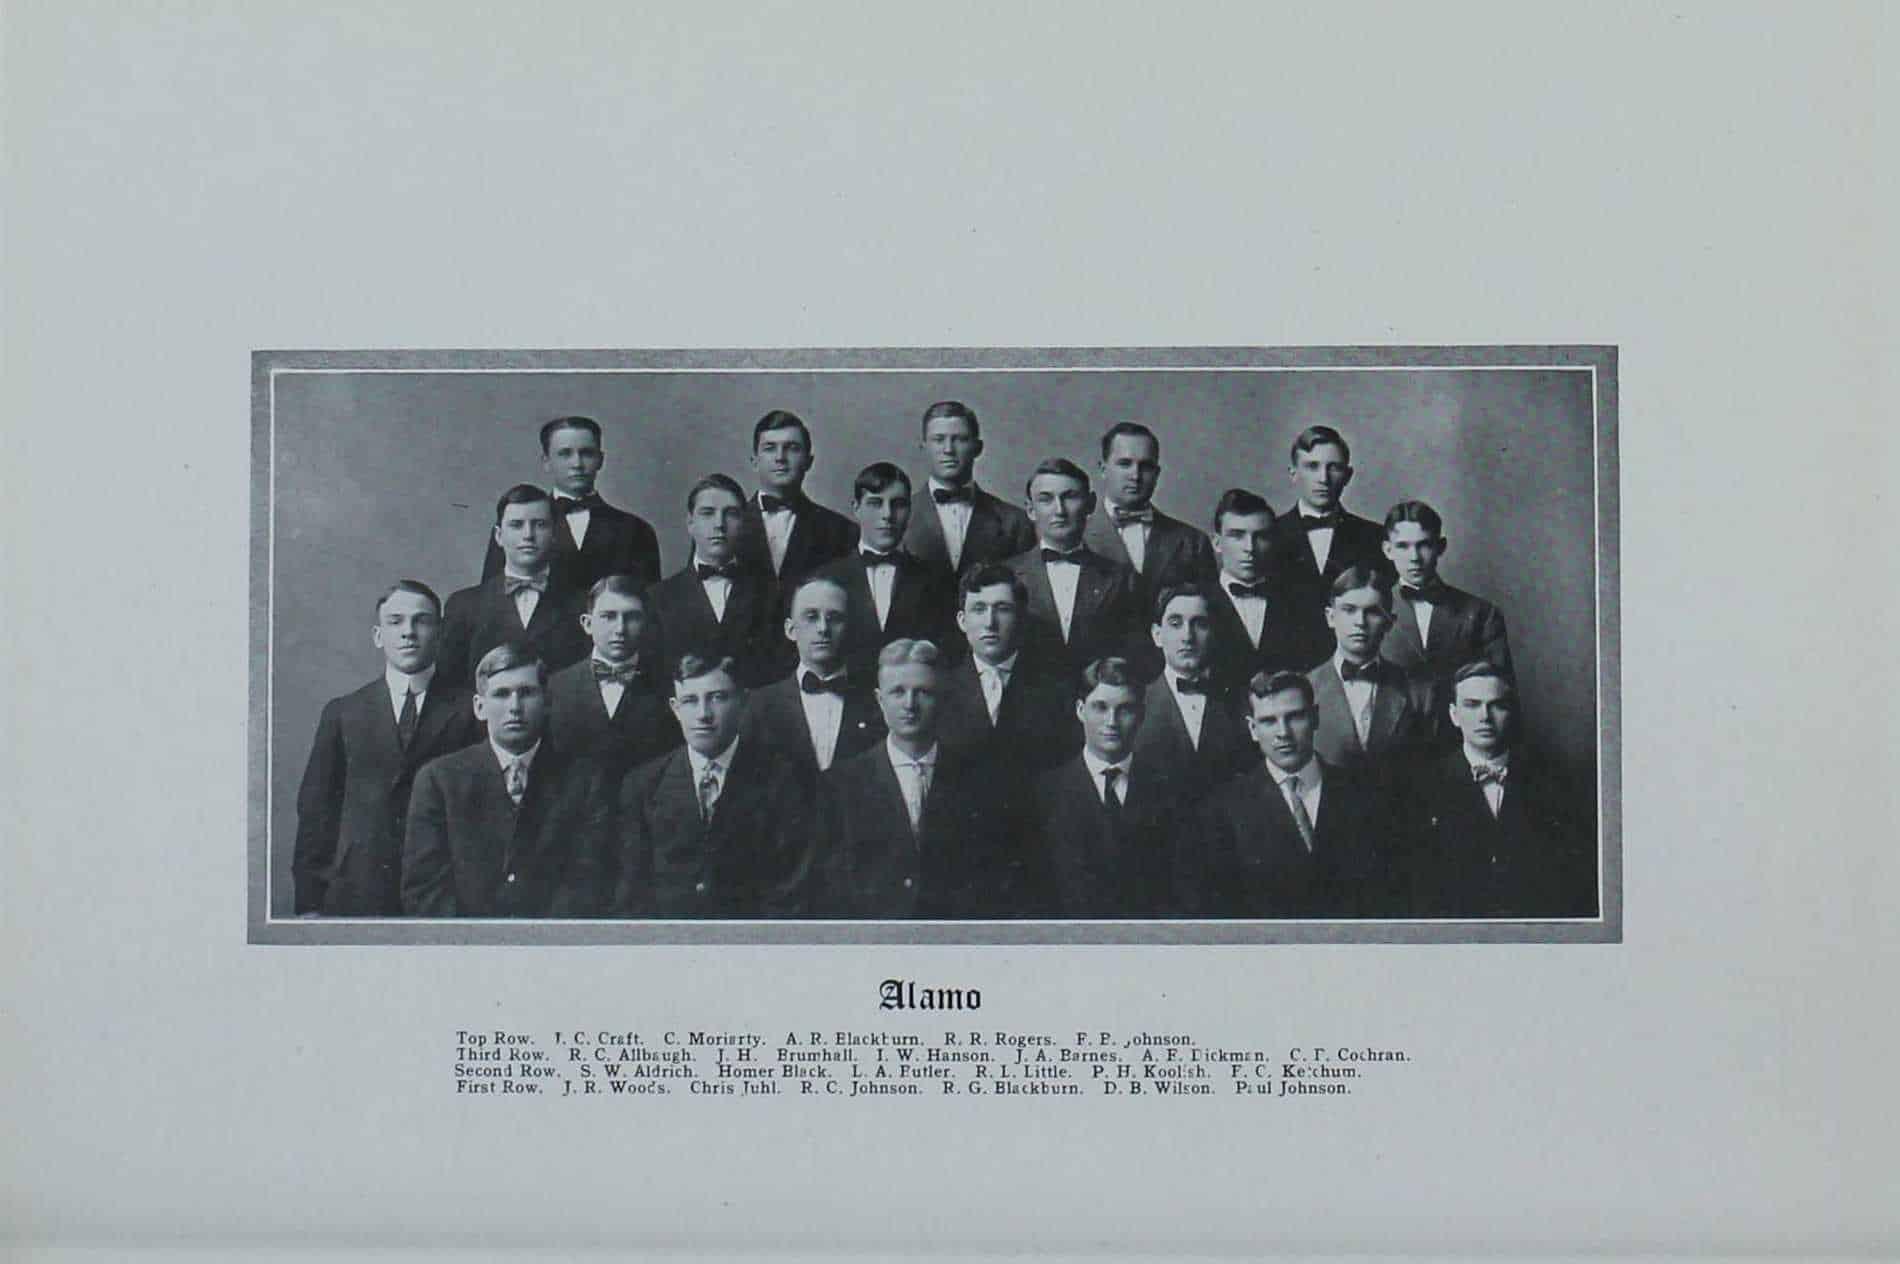 1911 Alamo Club